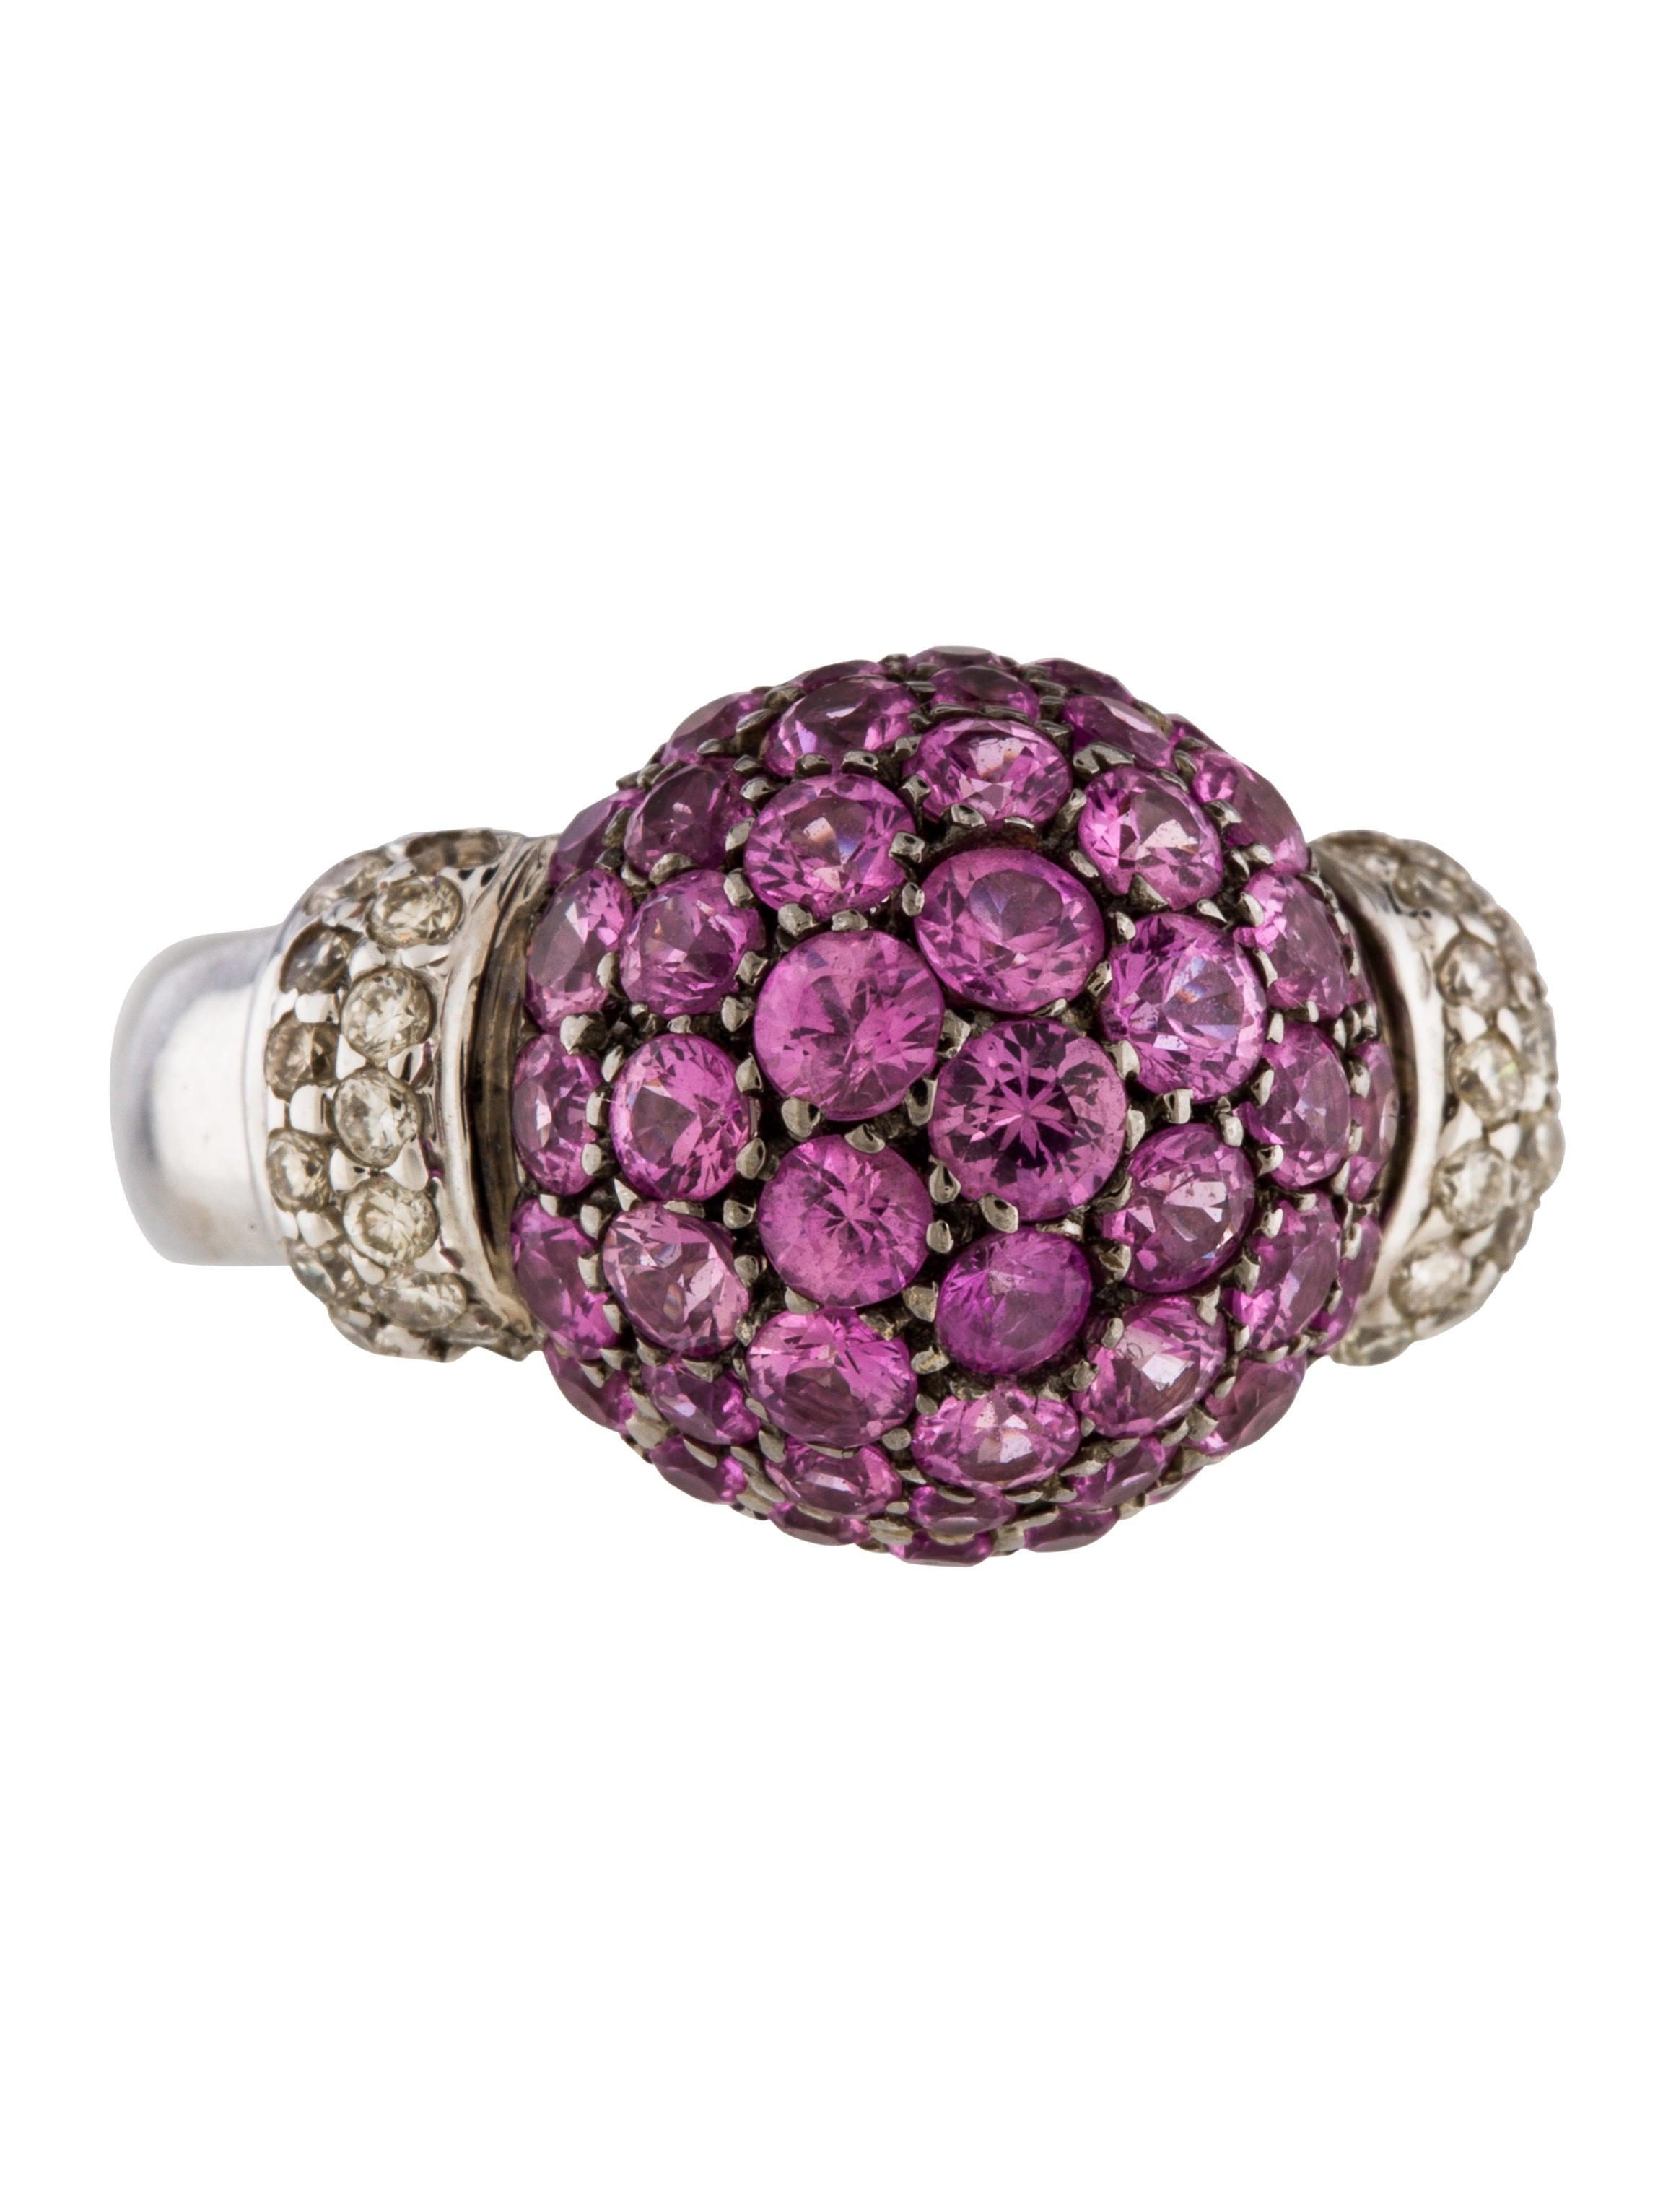 18K Pink Sapphire & Diamond Cocktail Ring - Rings ...